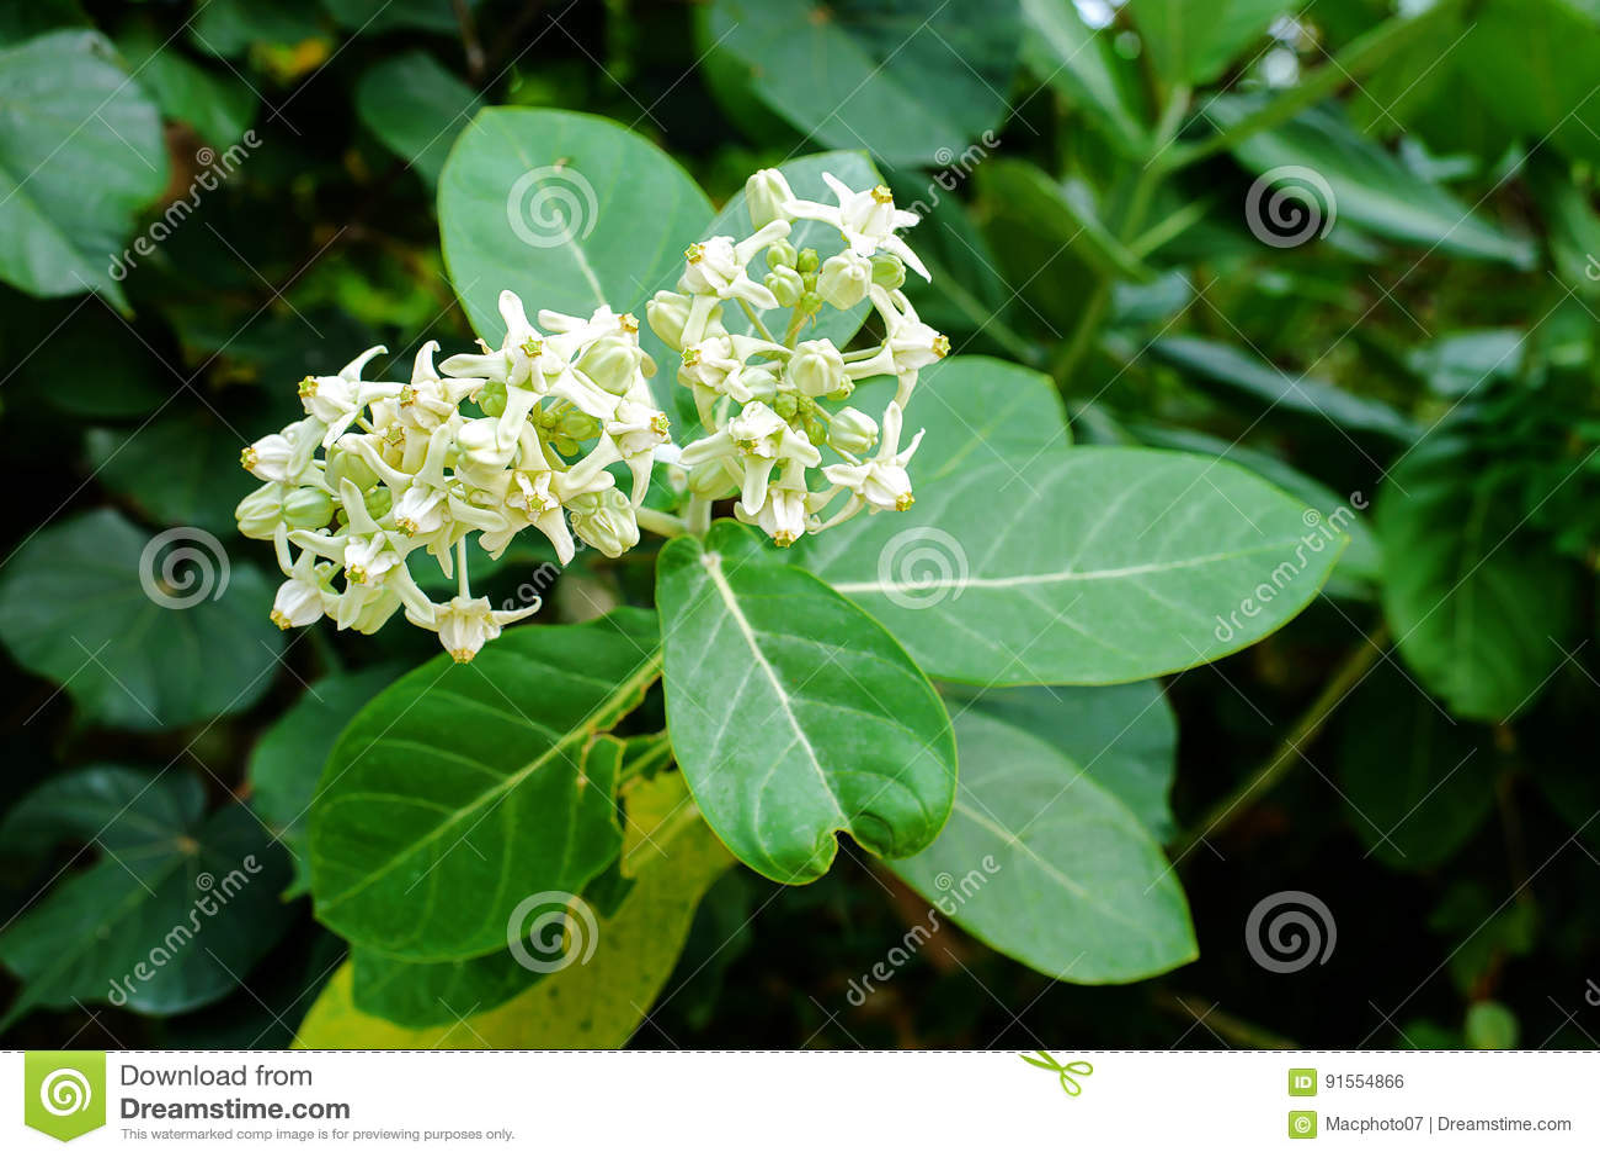 Crown Flower Blooming On The Tree Calotropis Gigantea Stock Photo